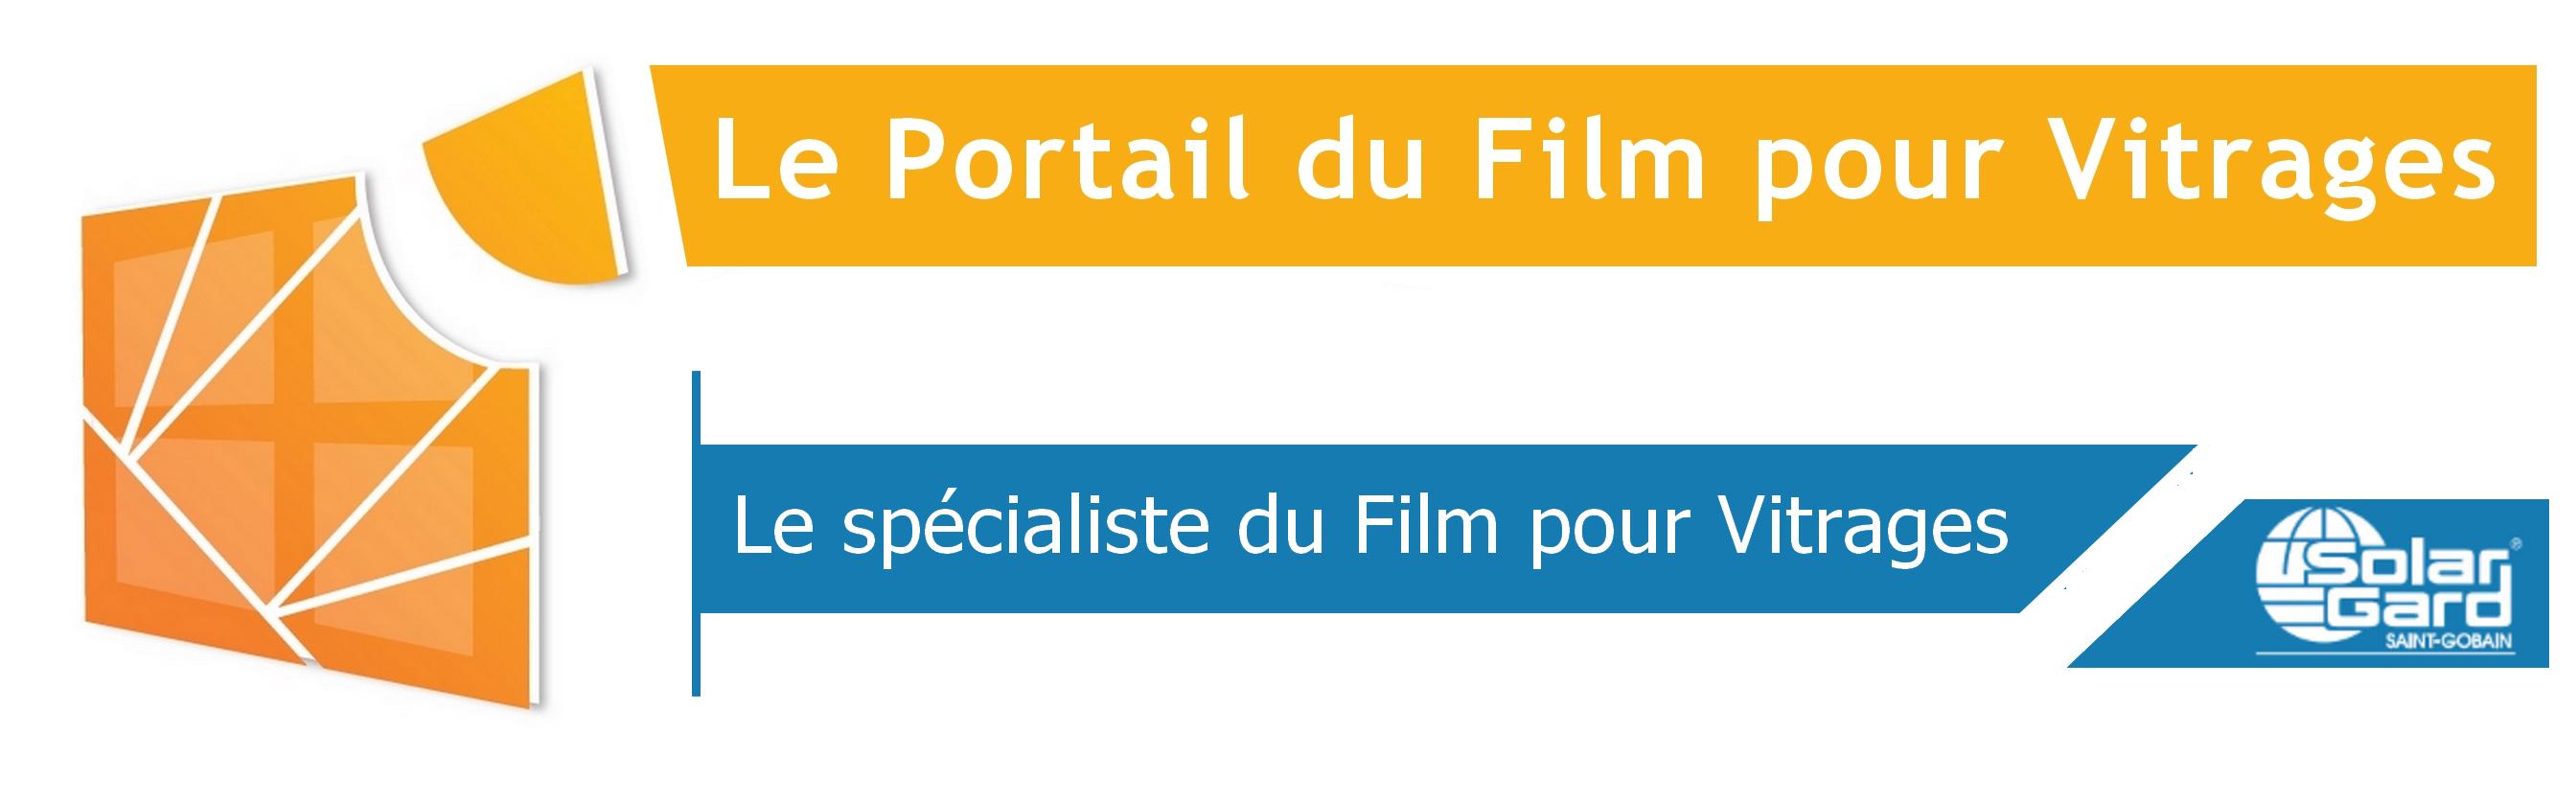 Tarif Vitrage Saint Gobain films de protection solargard saint-gobain - pour